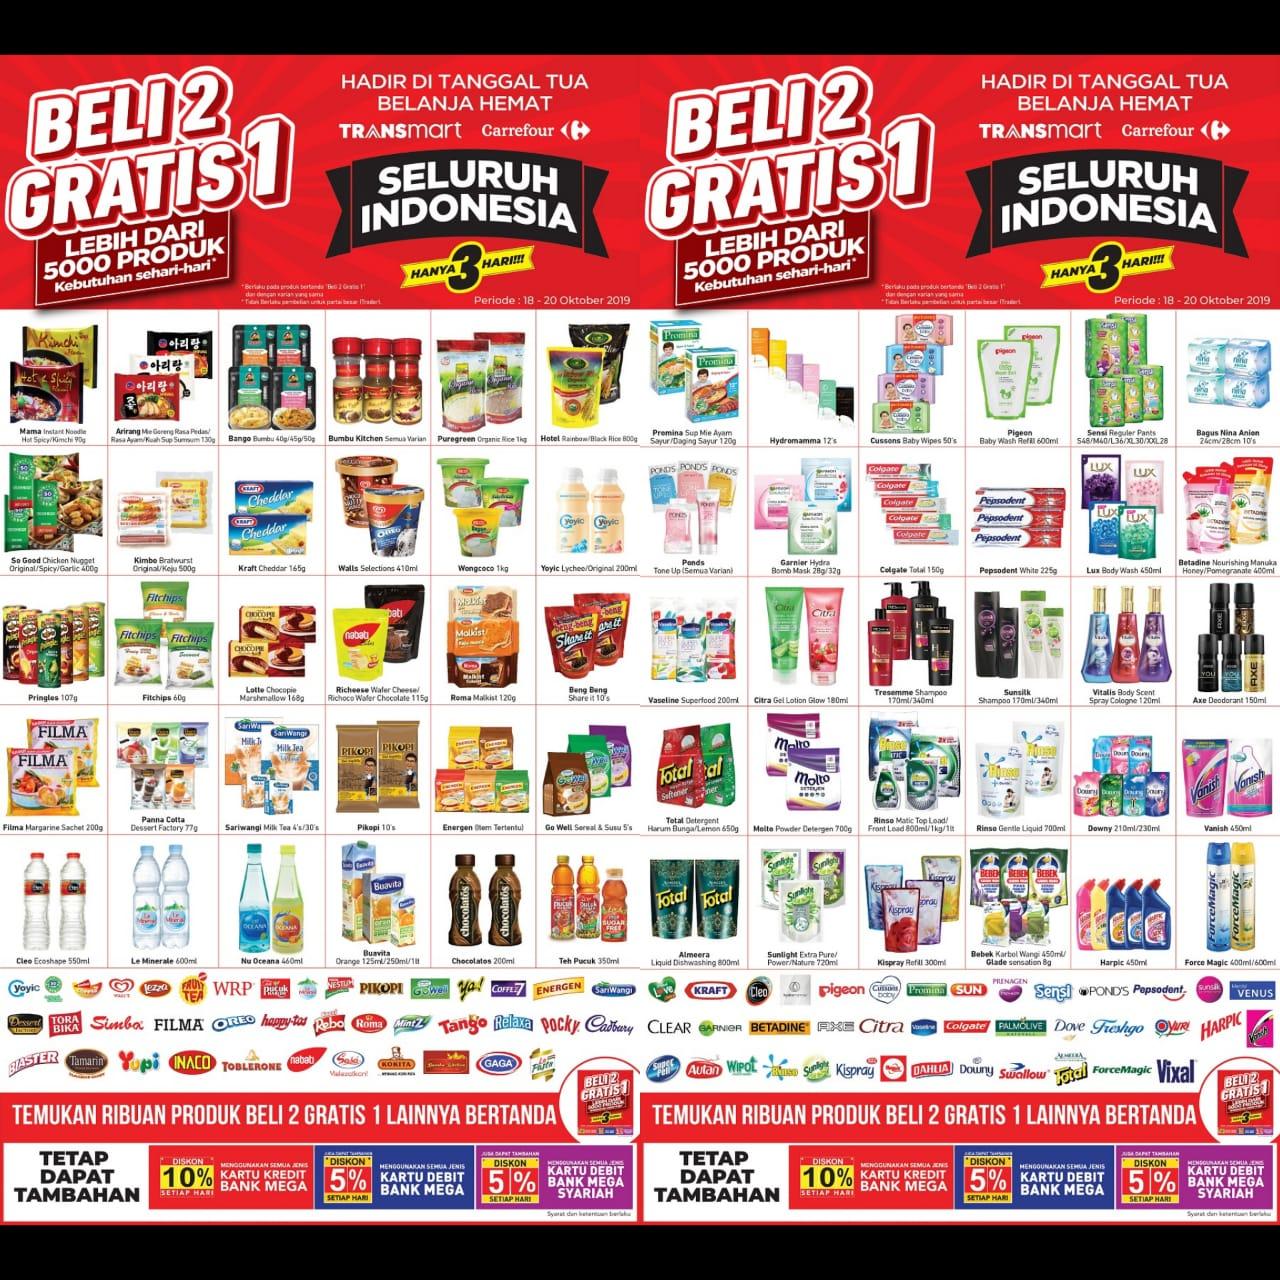 Katalog Promo JSM Transmart Carrefour Periode 18-20 Oktober 2019